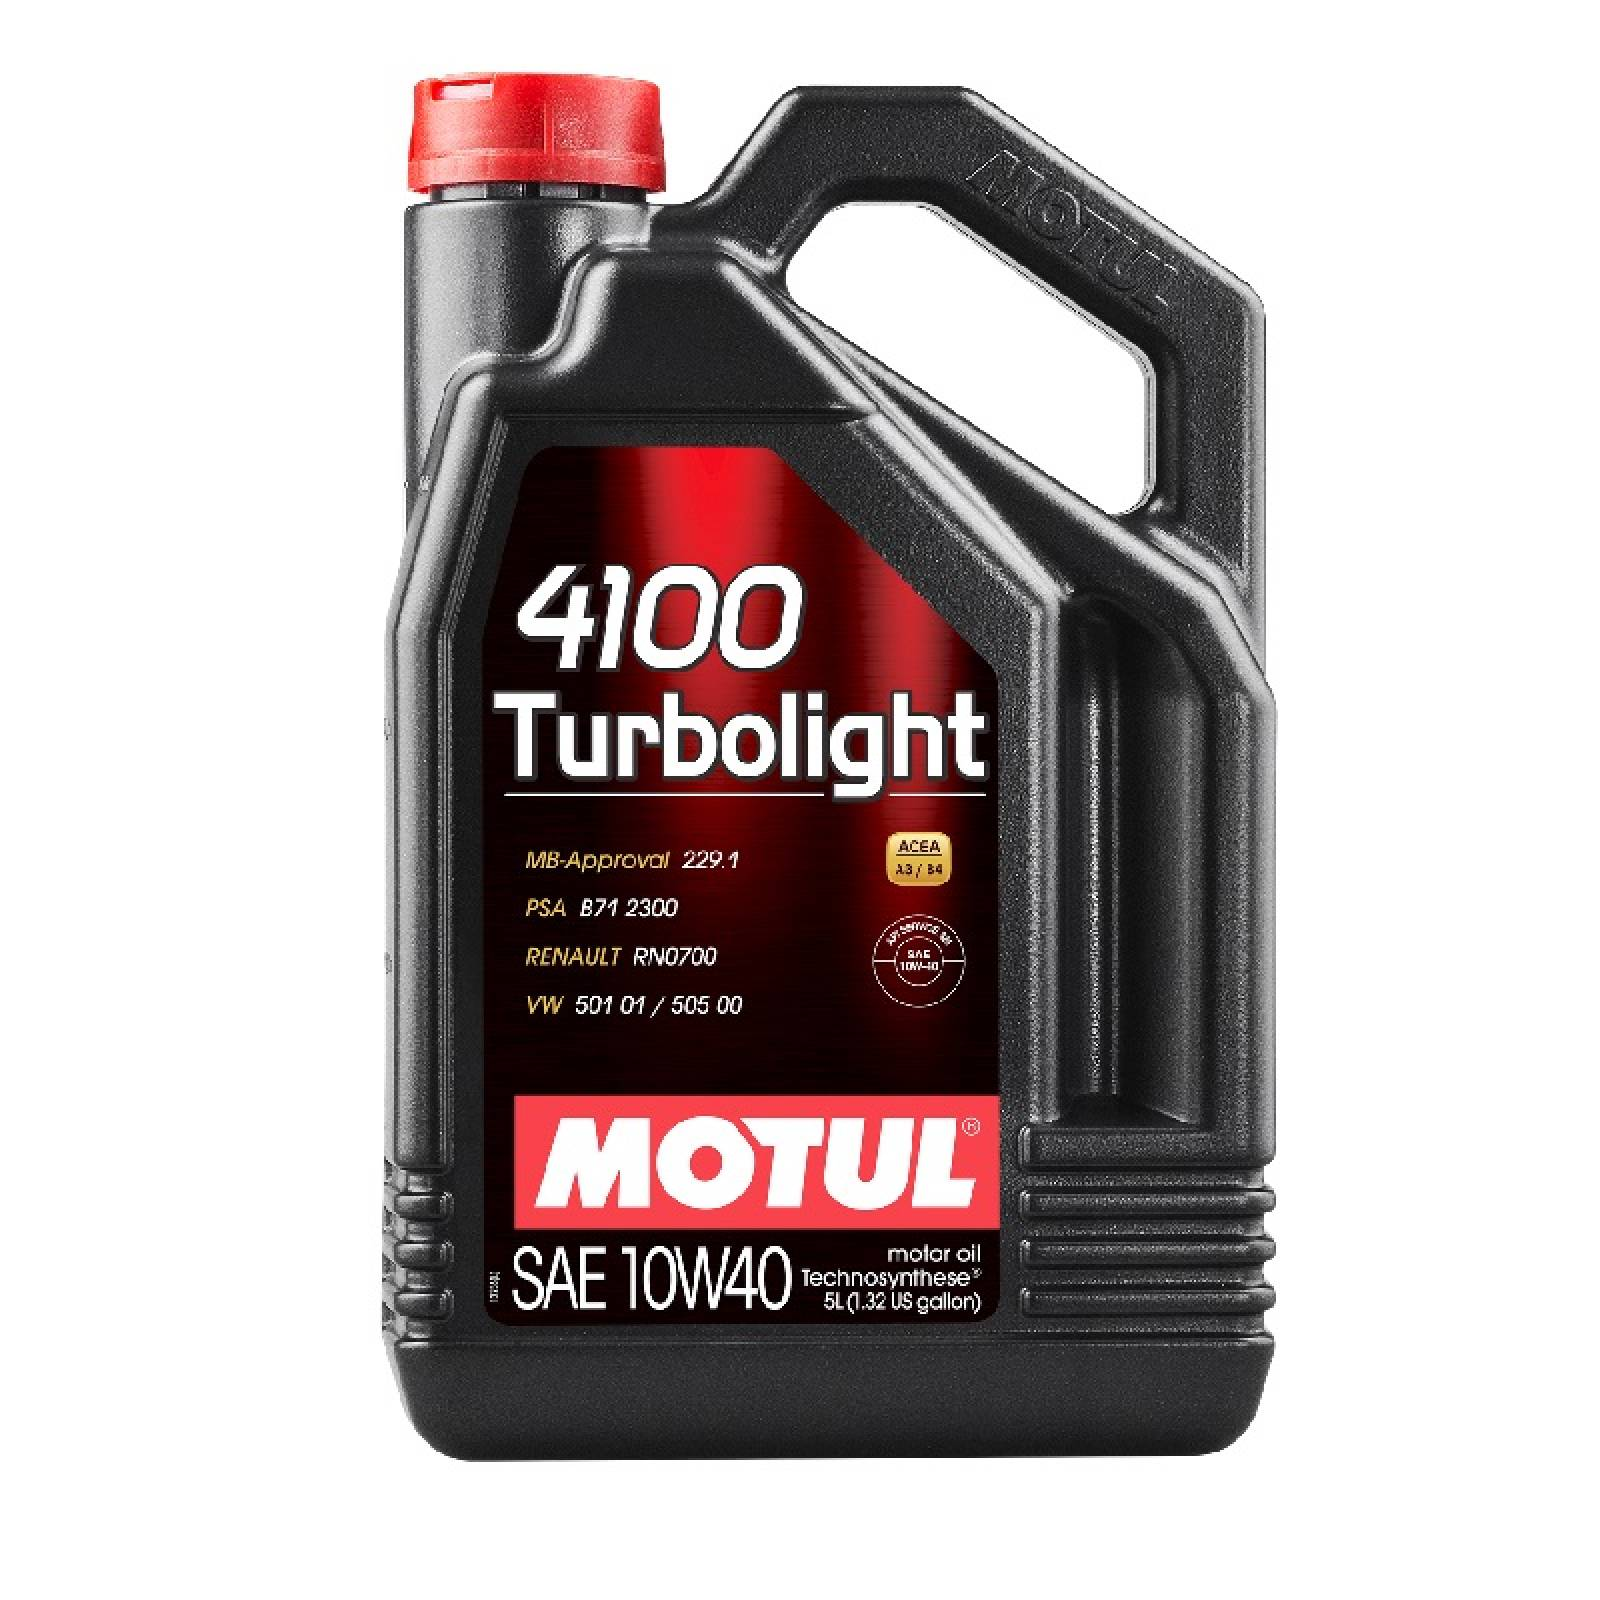 Aceite Motor Technosynthese Motul 4100 Turbolight 10W40  5 Litros